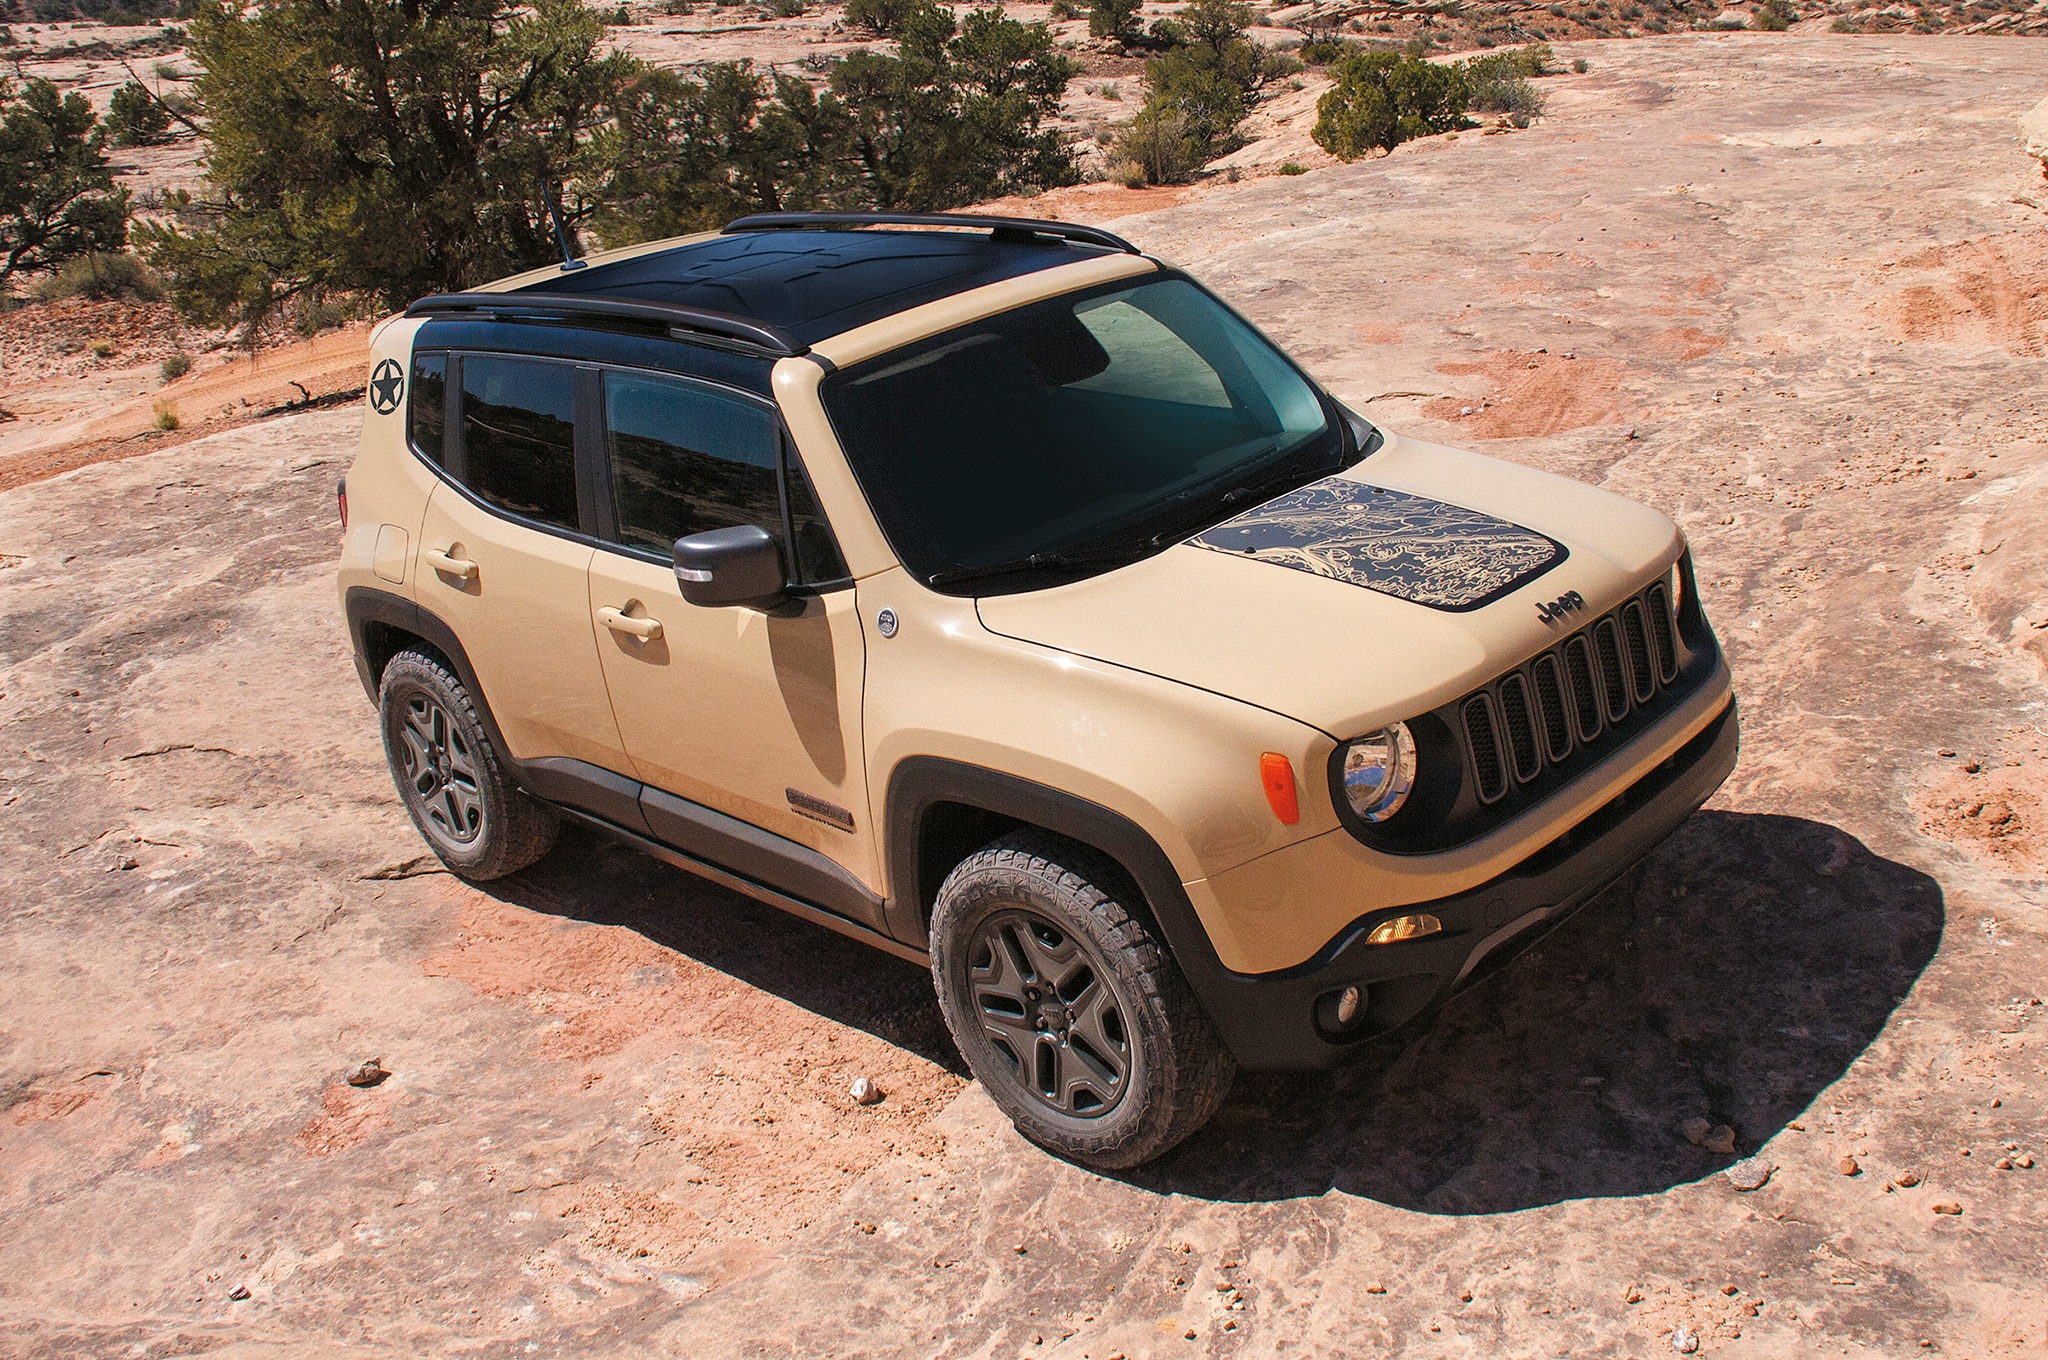 2017 Jeep Renegade Deserthawk Front Three Quarter